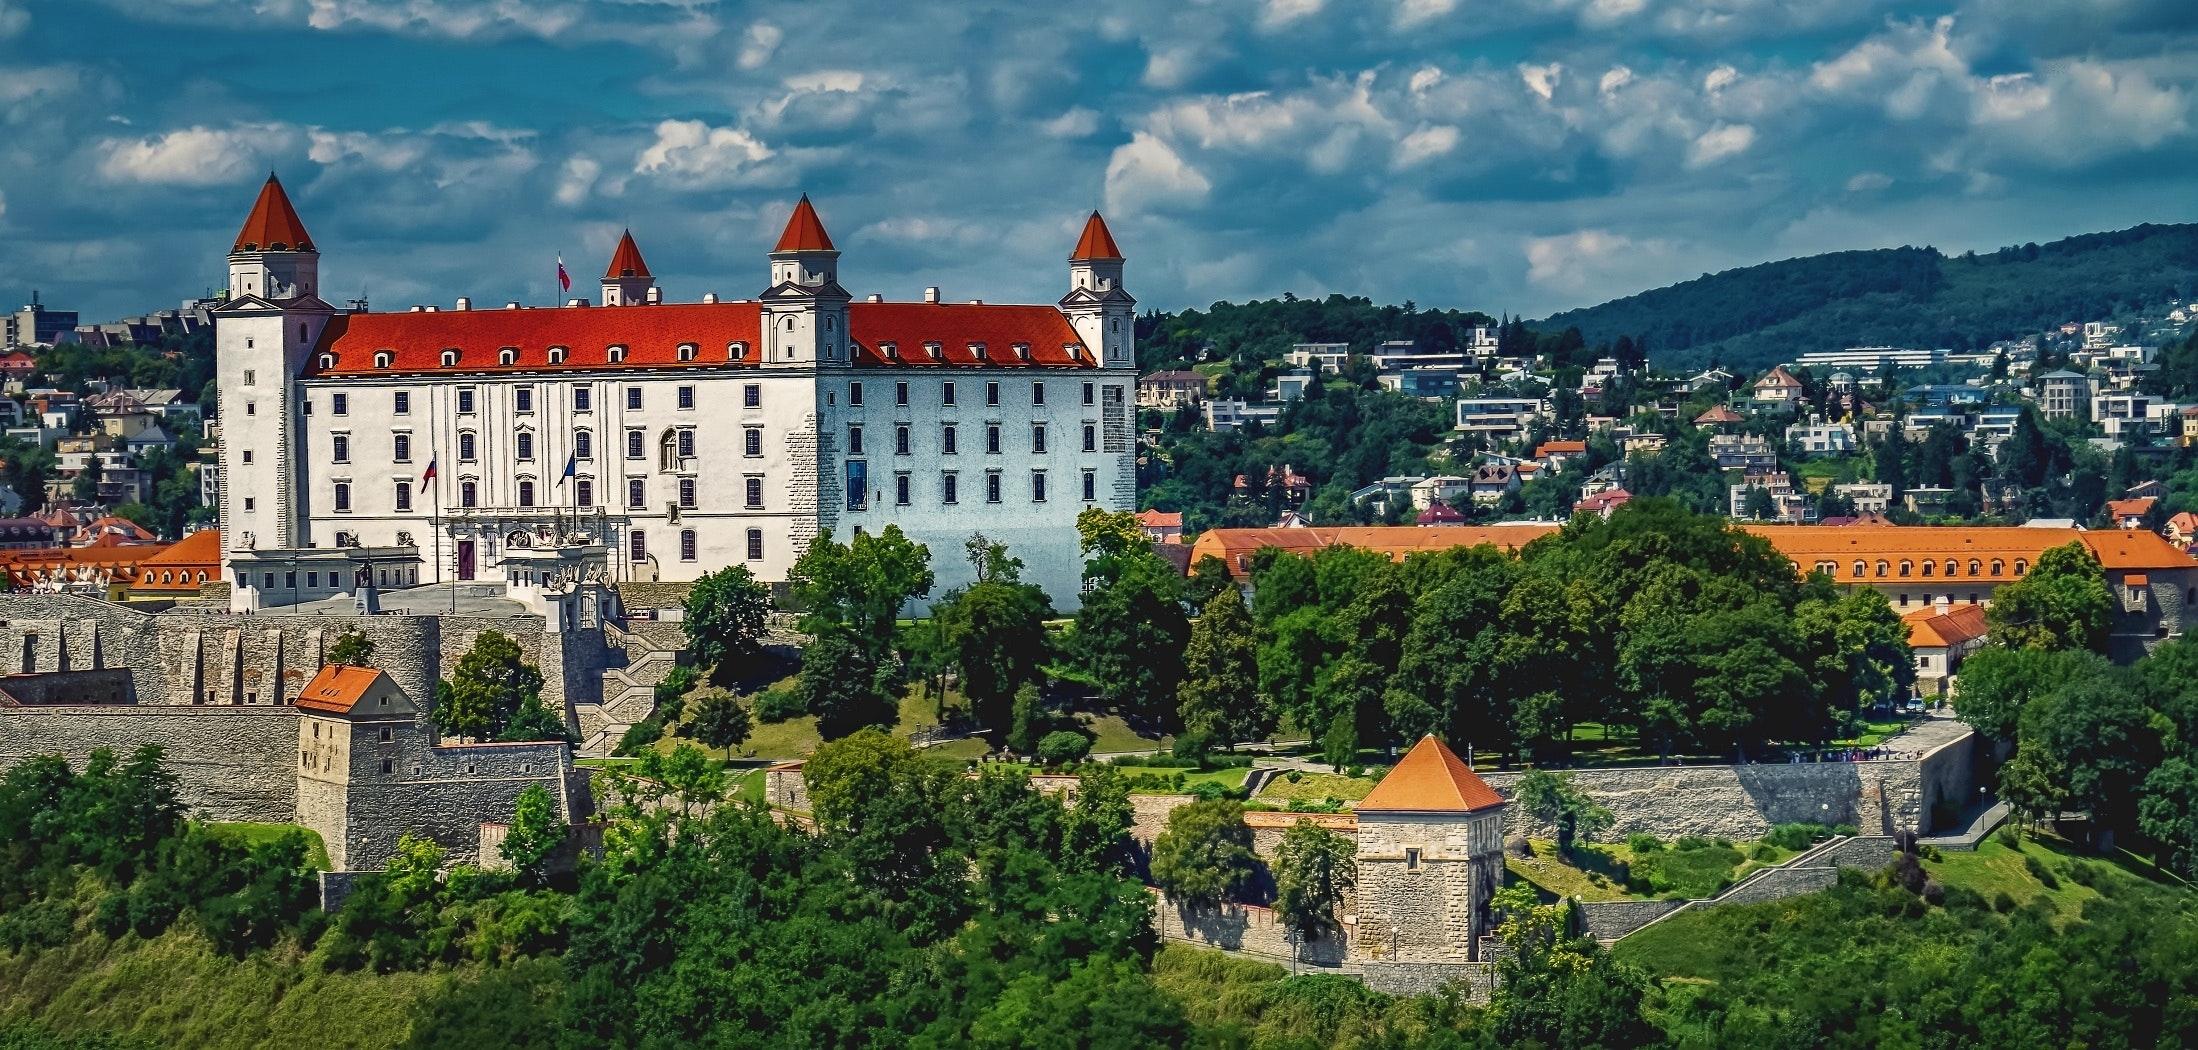 architecture bratislava bratislava castle 280173 - Contact